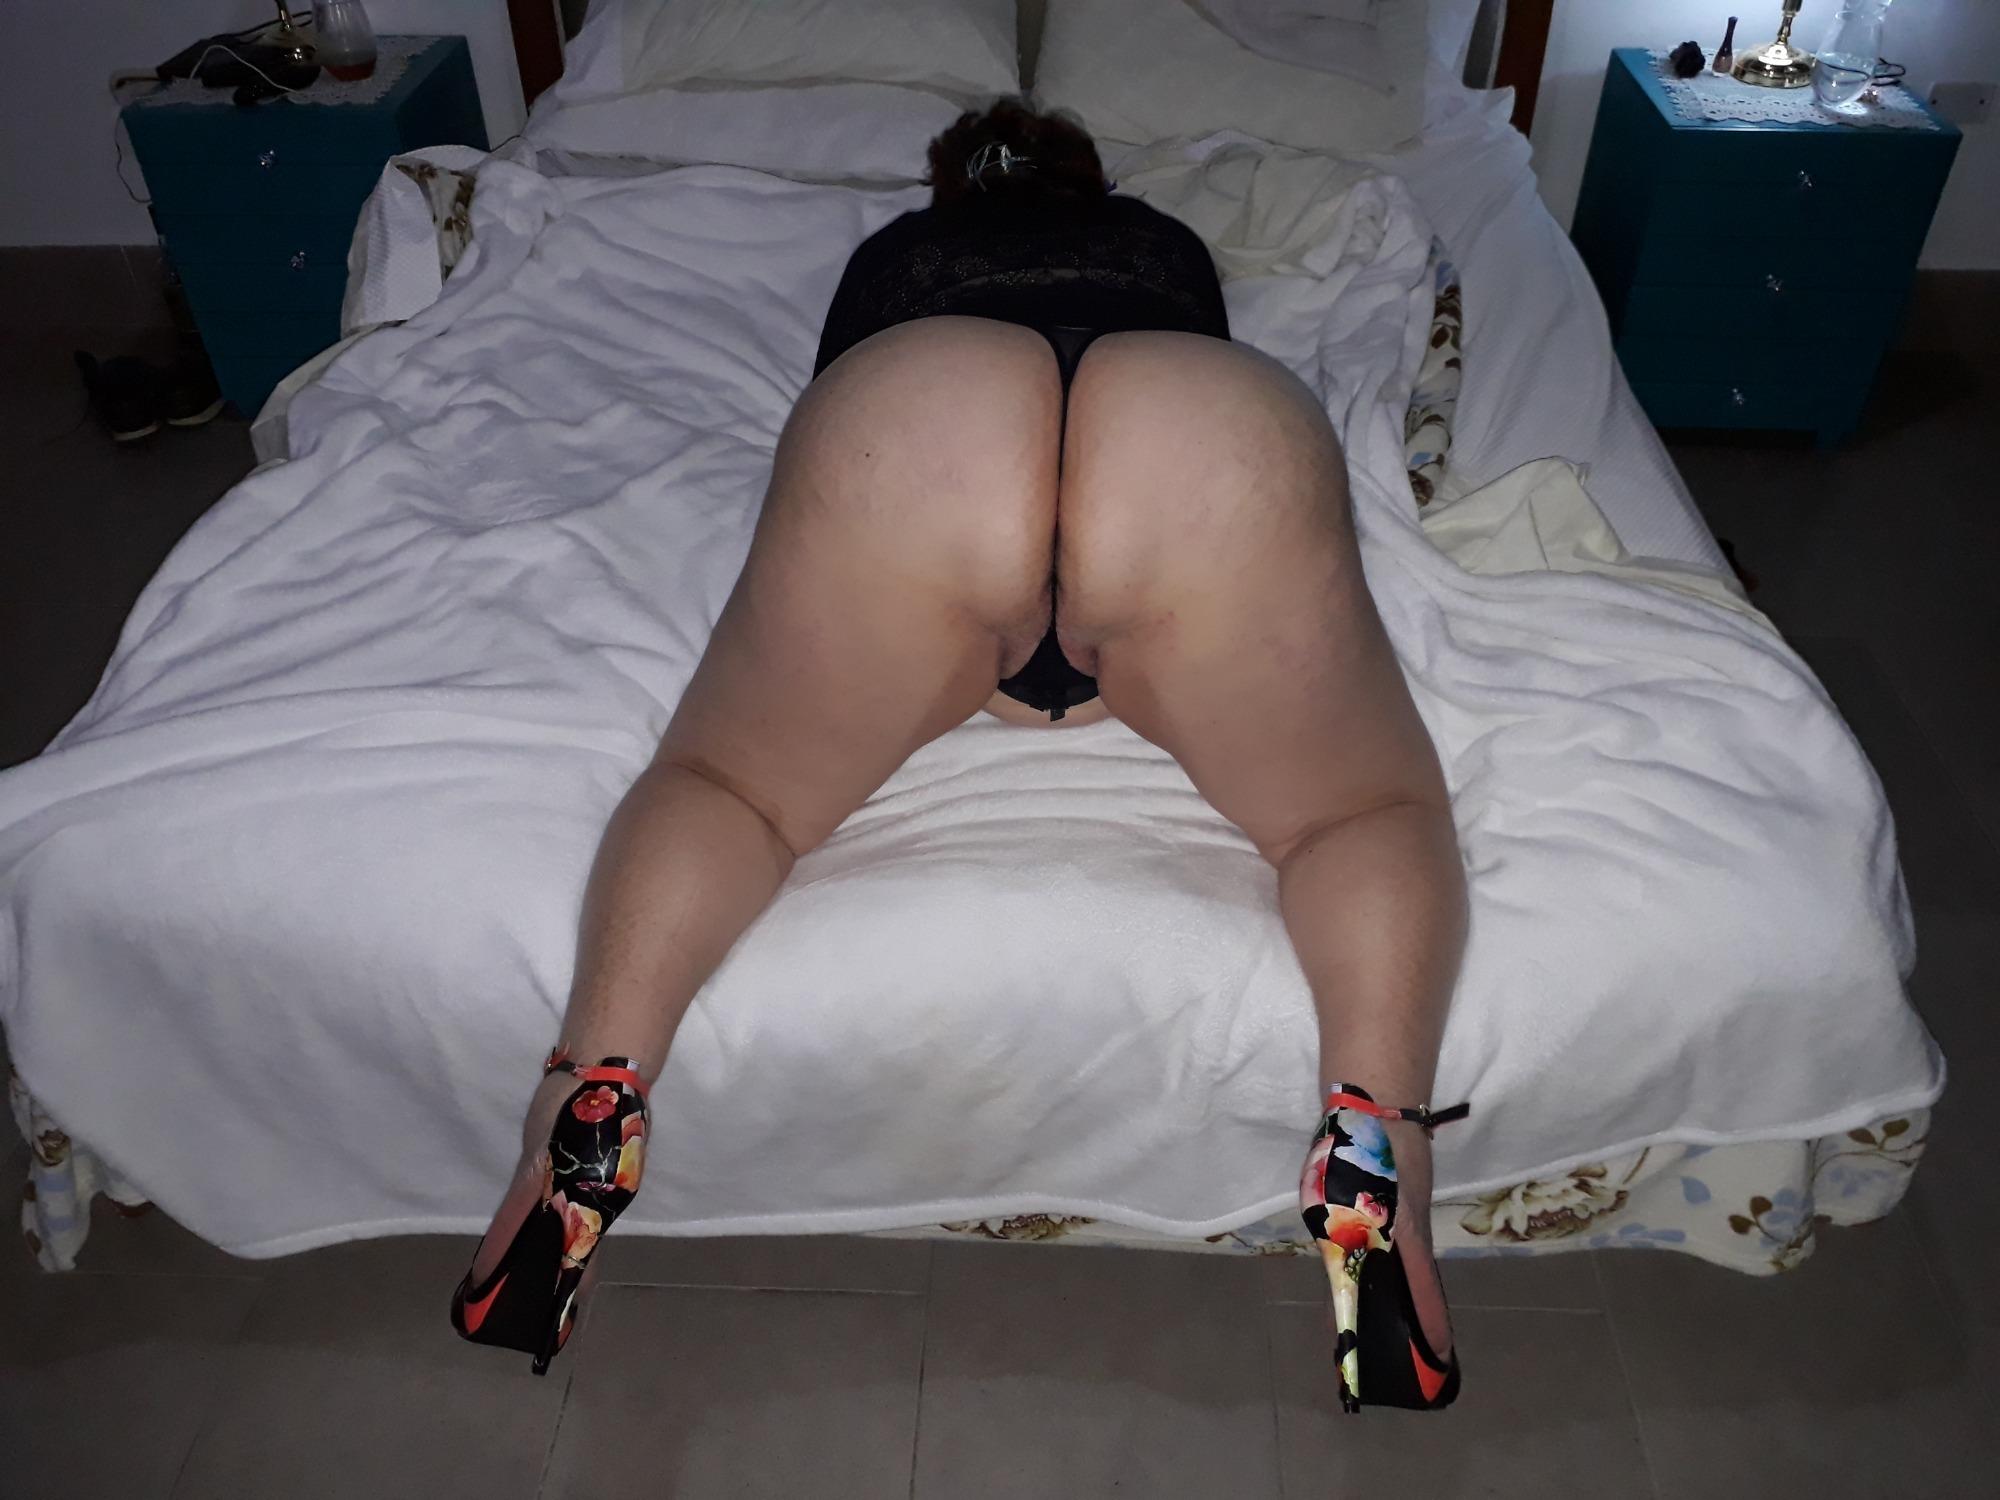 Fotos XXX señoras gordas, mujeres grandes, gruesas, gordas porno